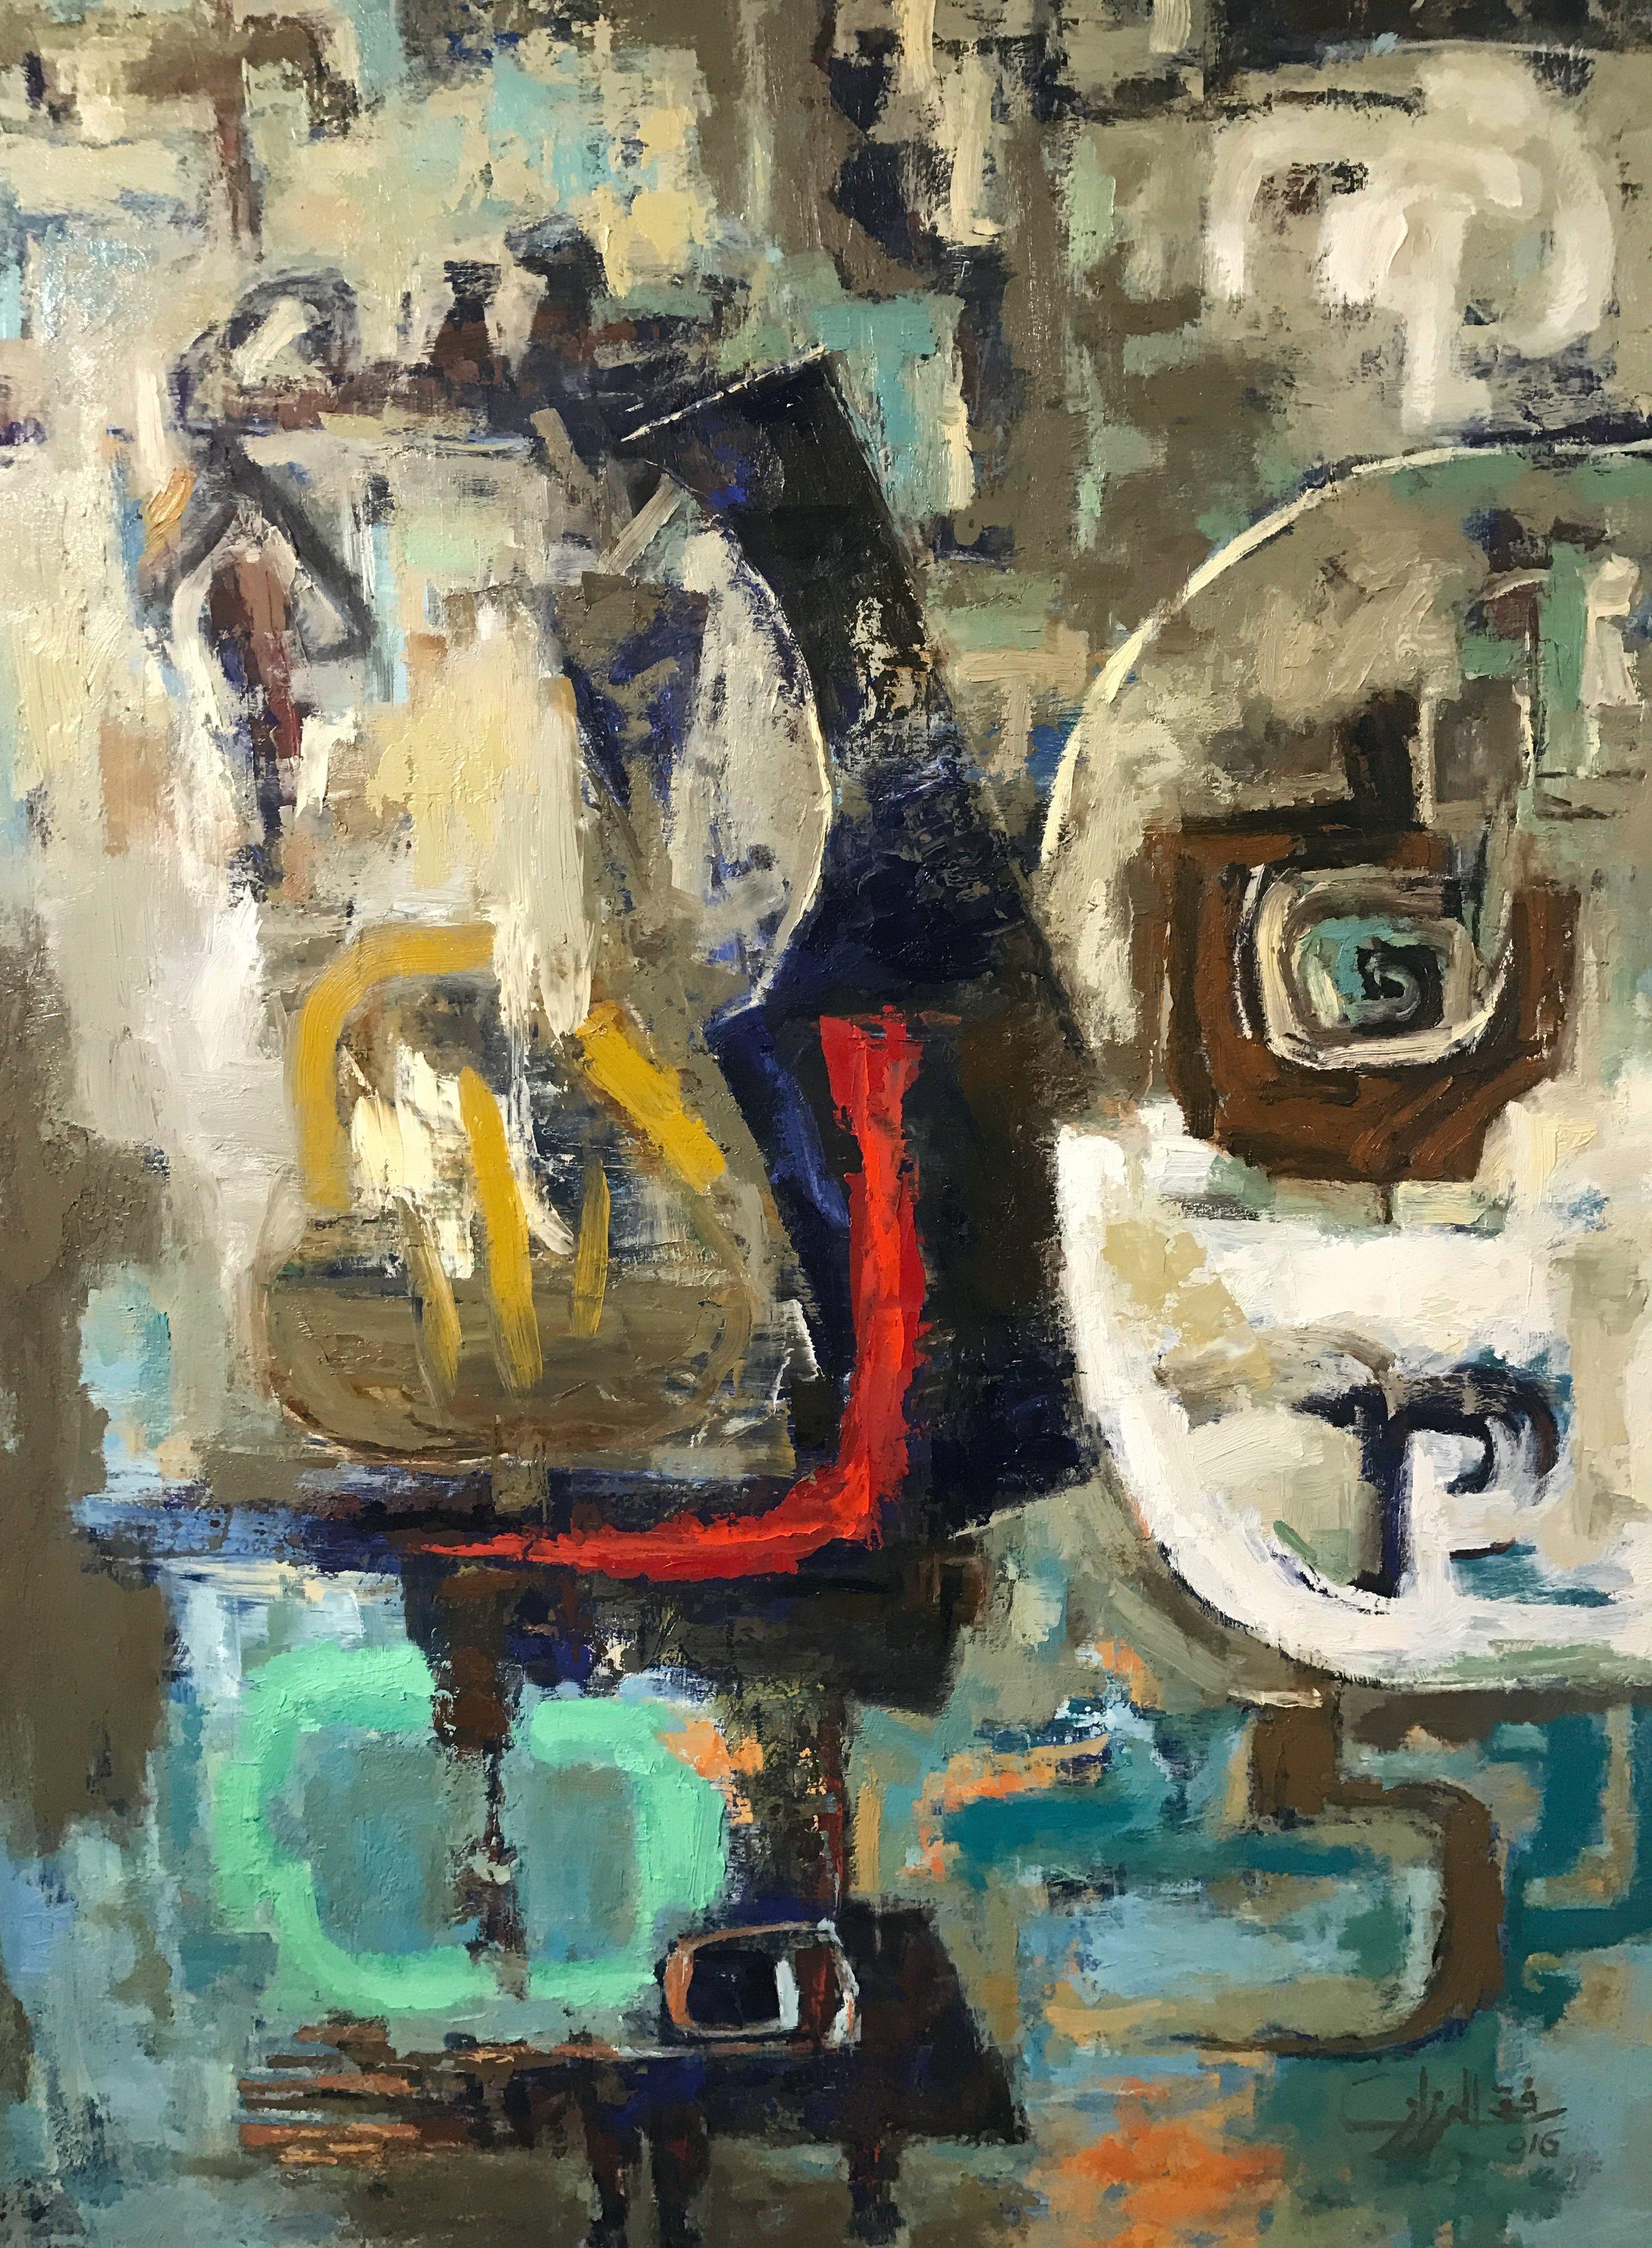 Refki El Razzaz   Oil on canvas (fixed on wood)  122 x 90 cm  2016